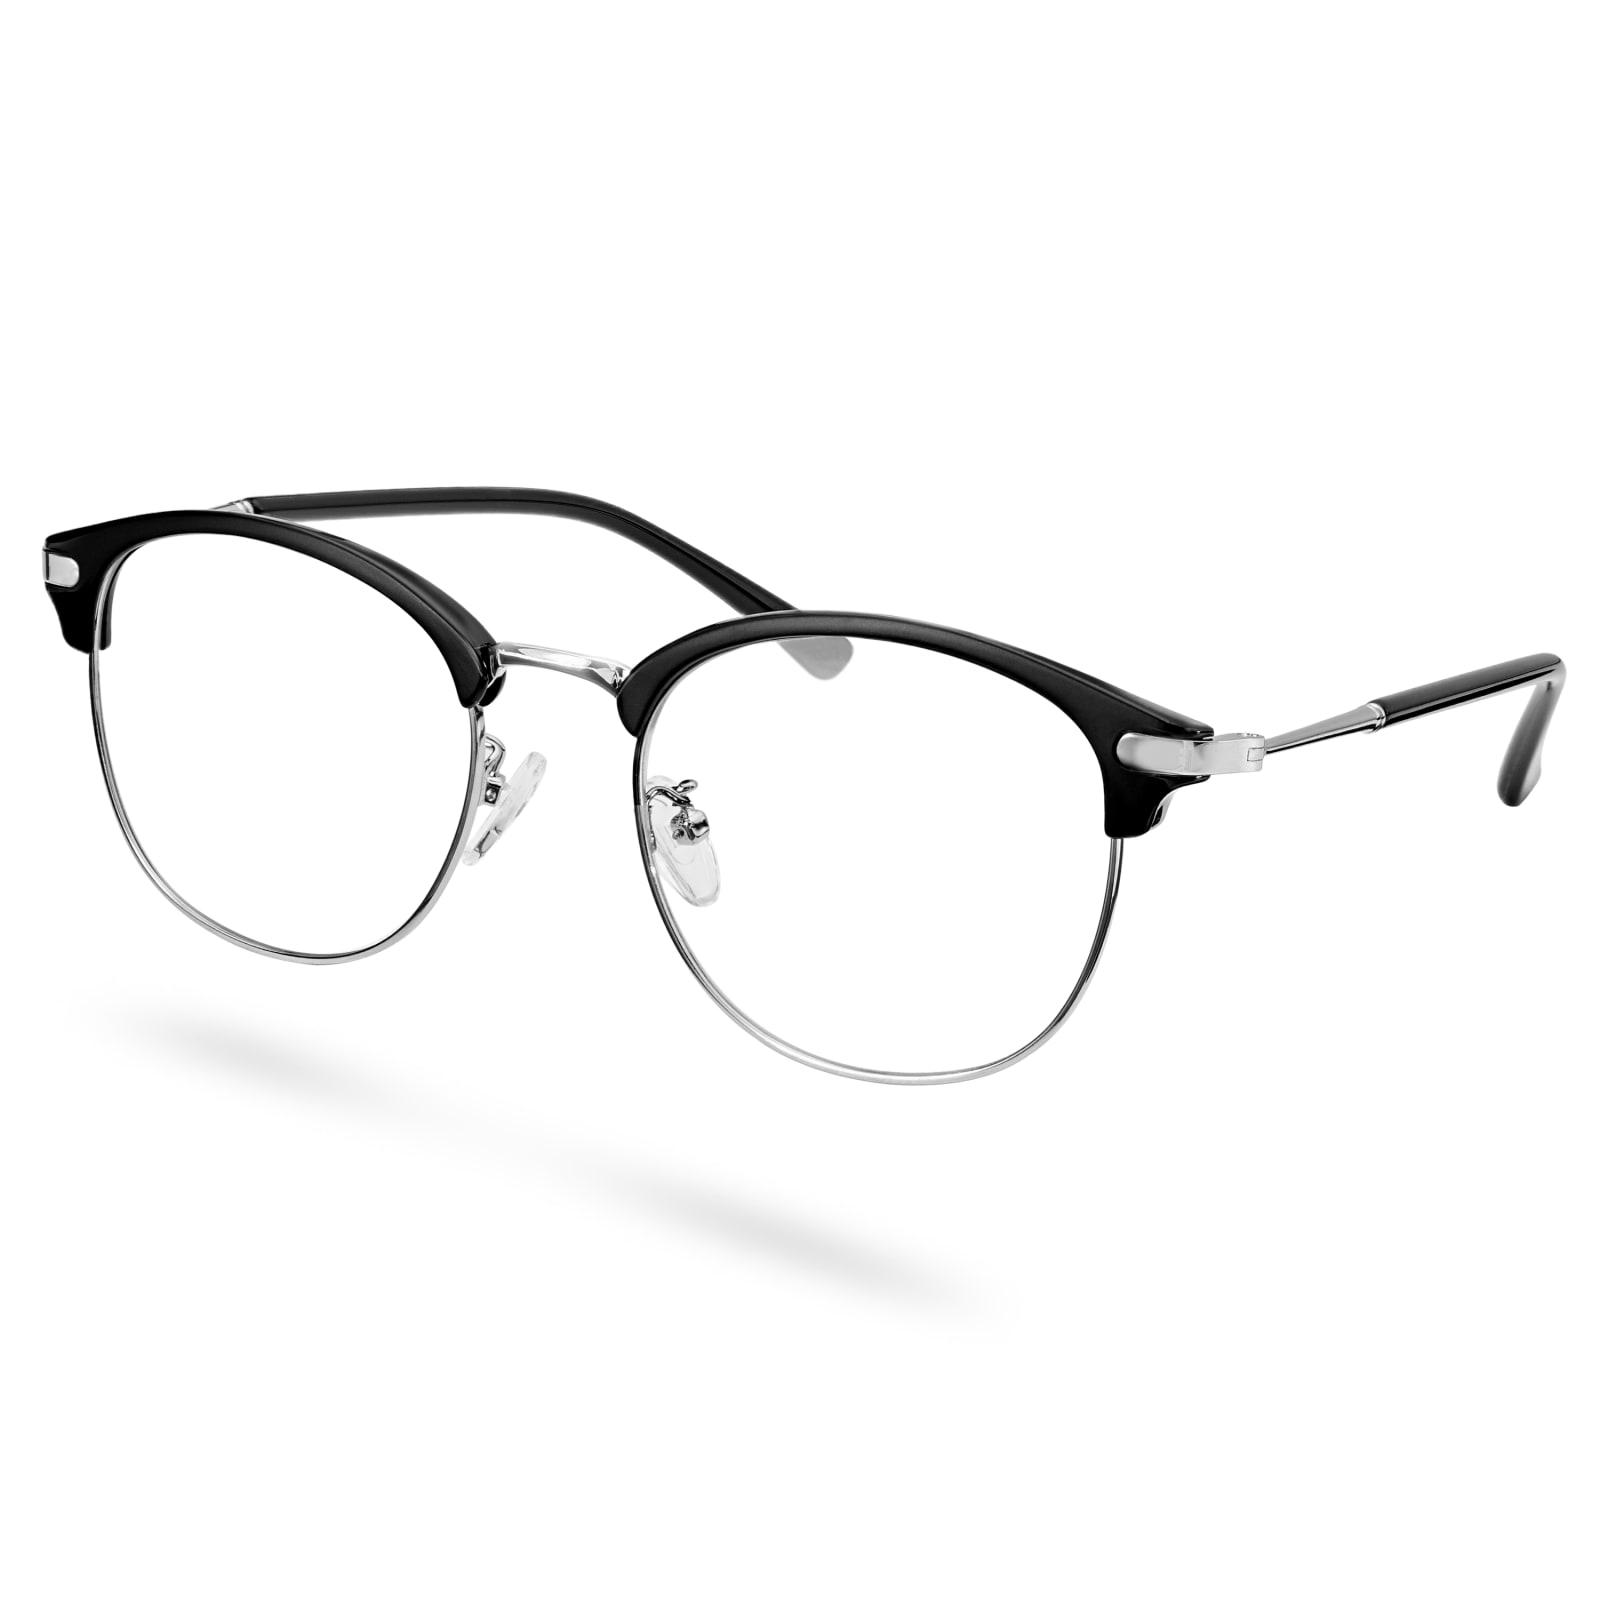 1c5fdc6d7 Lesklé čierne okuliare Classroom   Na sklade!   Paul Riley